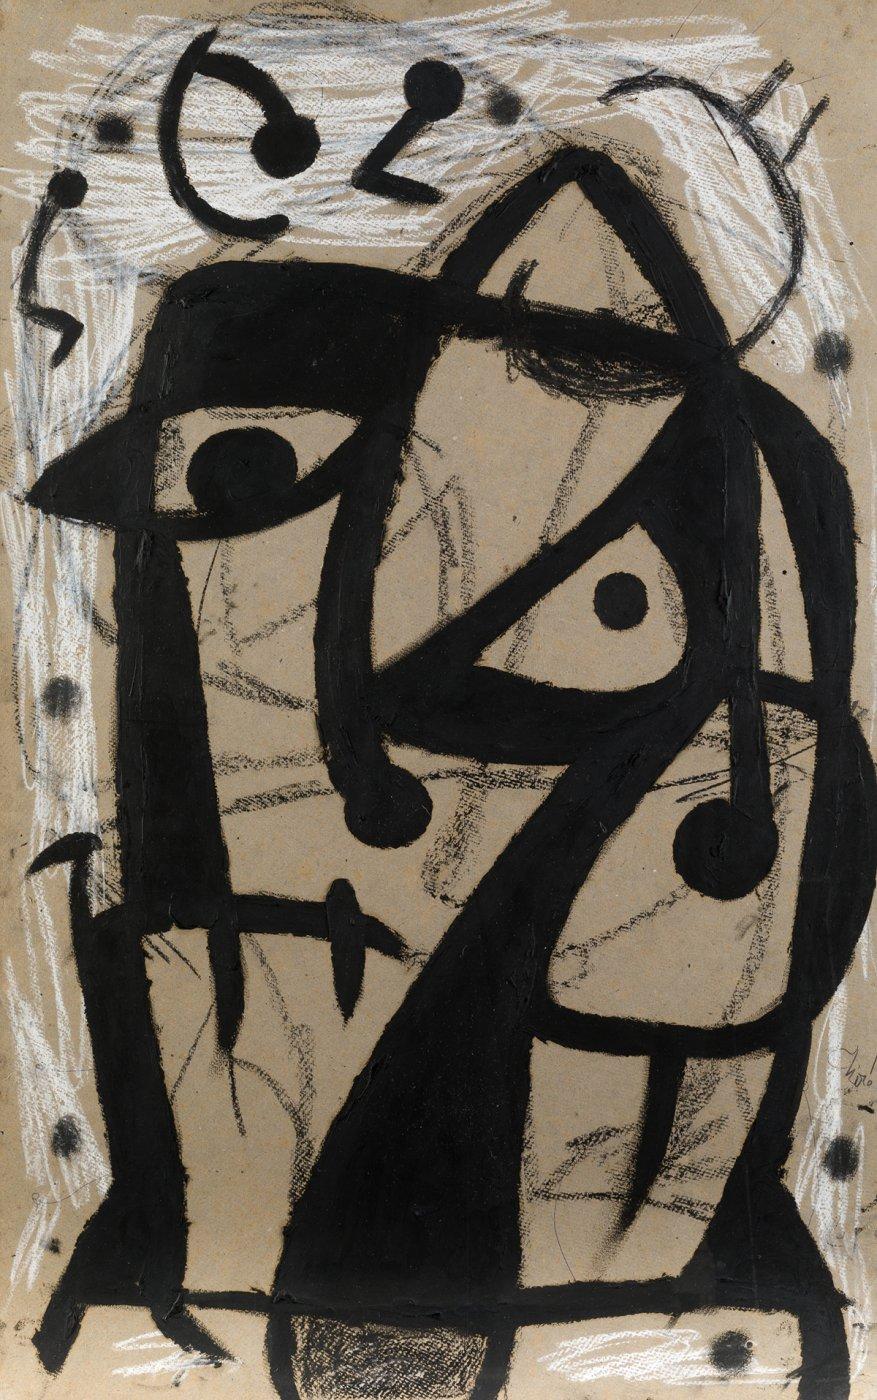 Joan Miró, Personnage, oiseaux, 1980. Salida: 80.000 euros. Remate: 150.000 euros